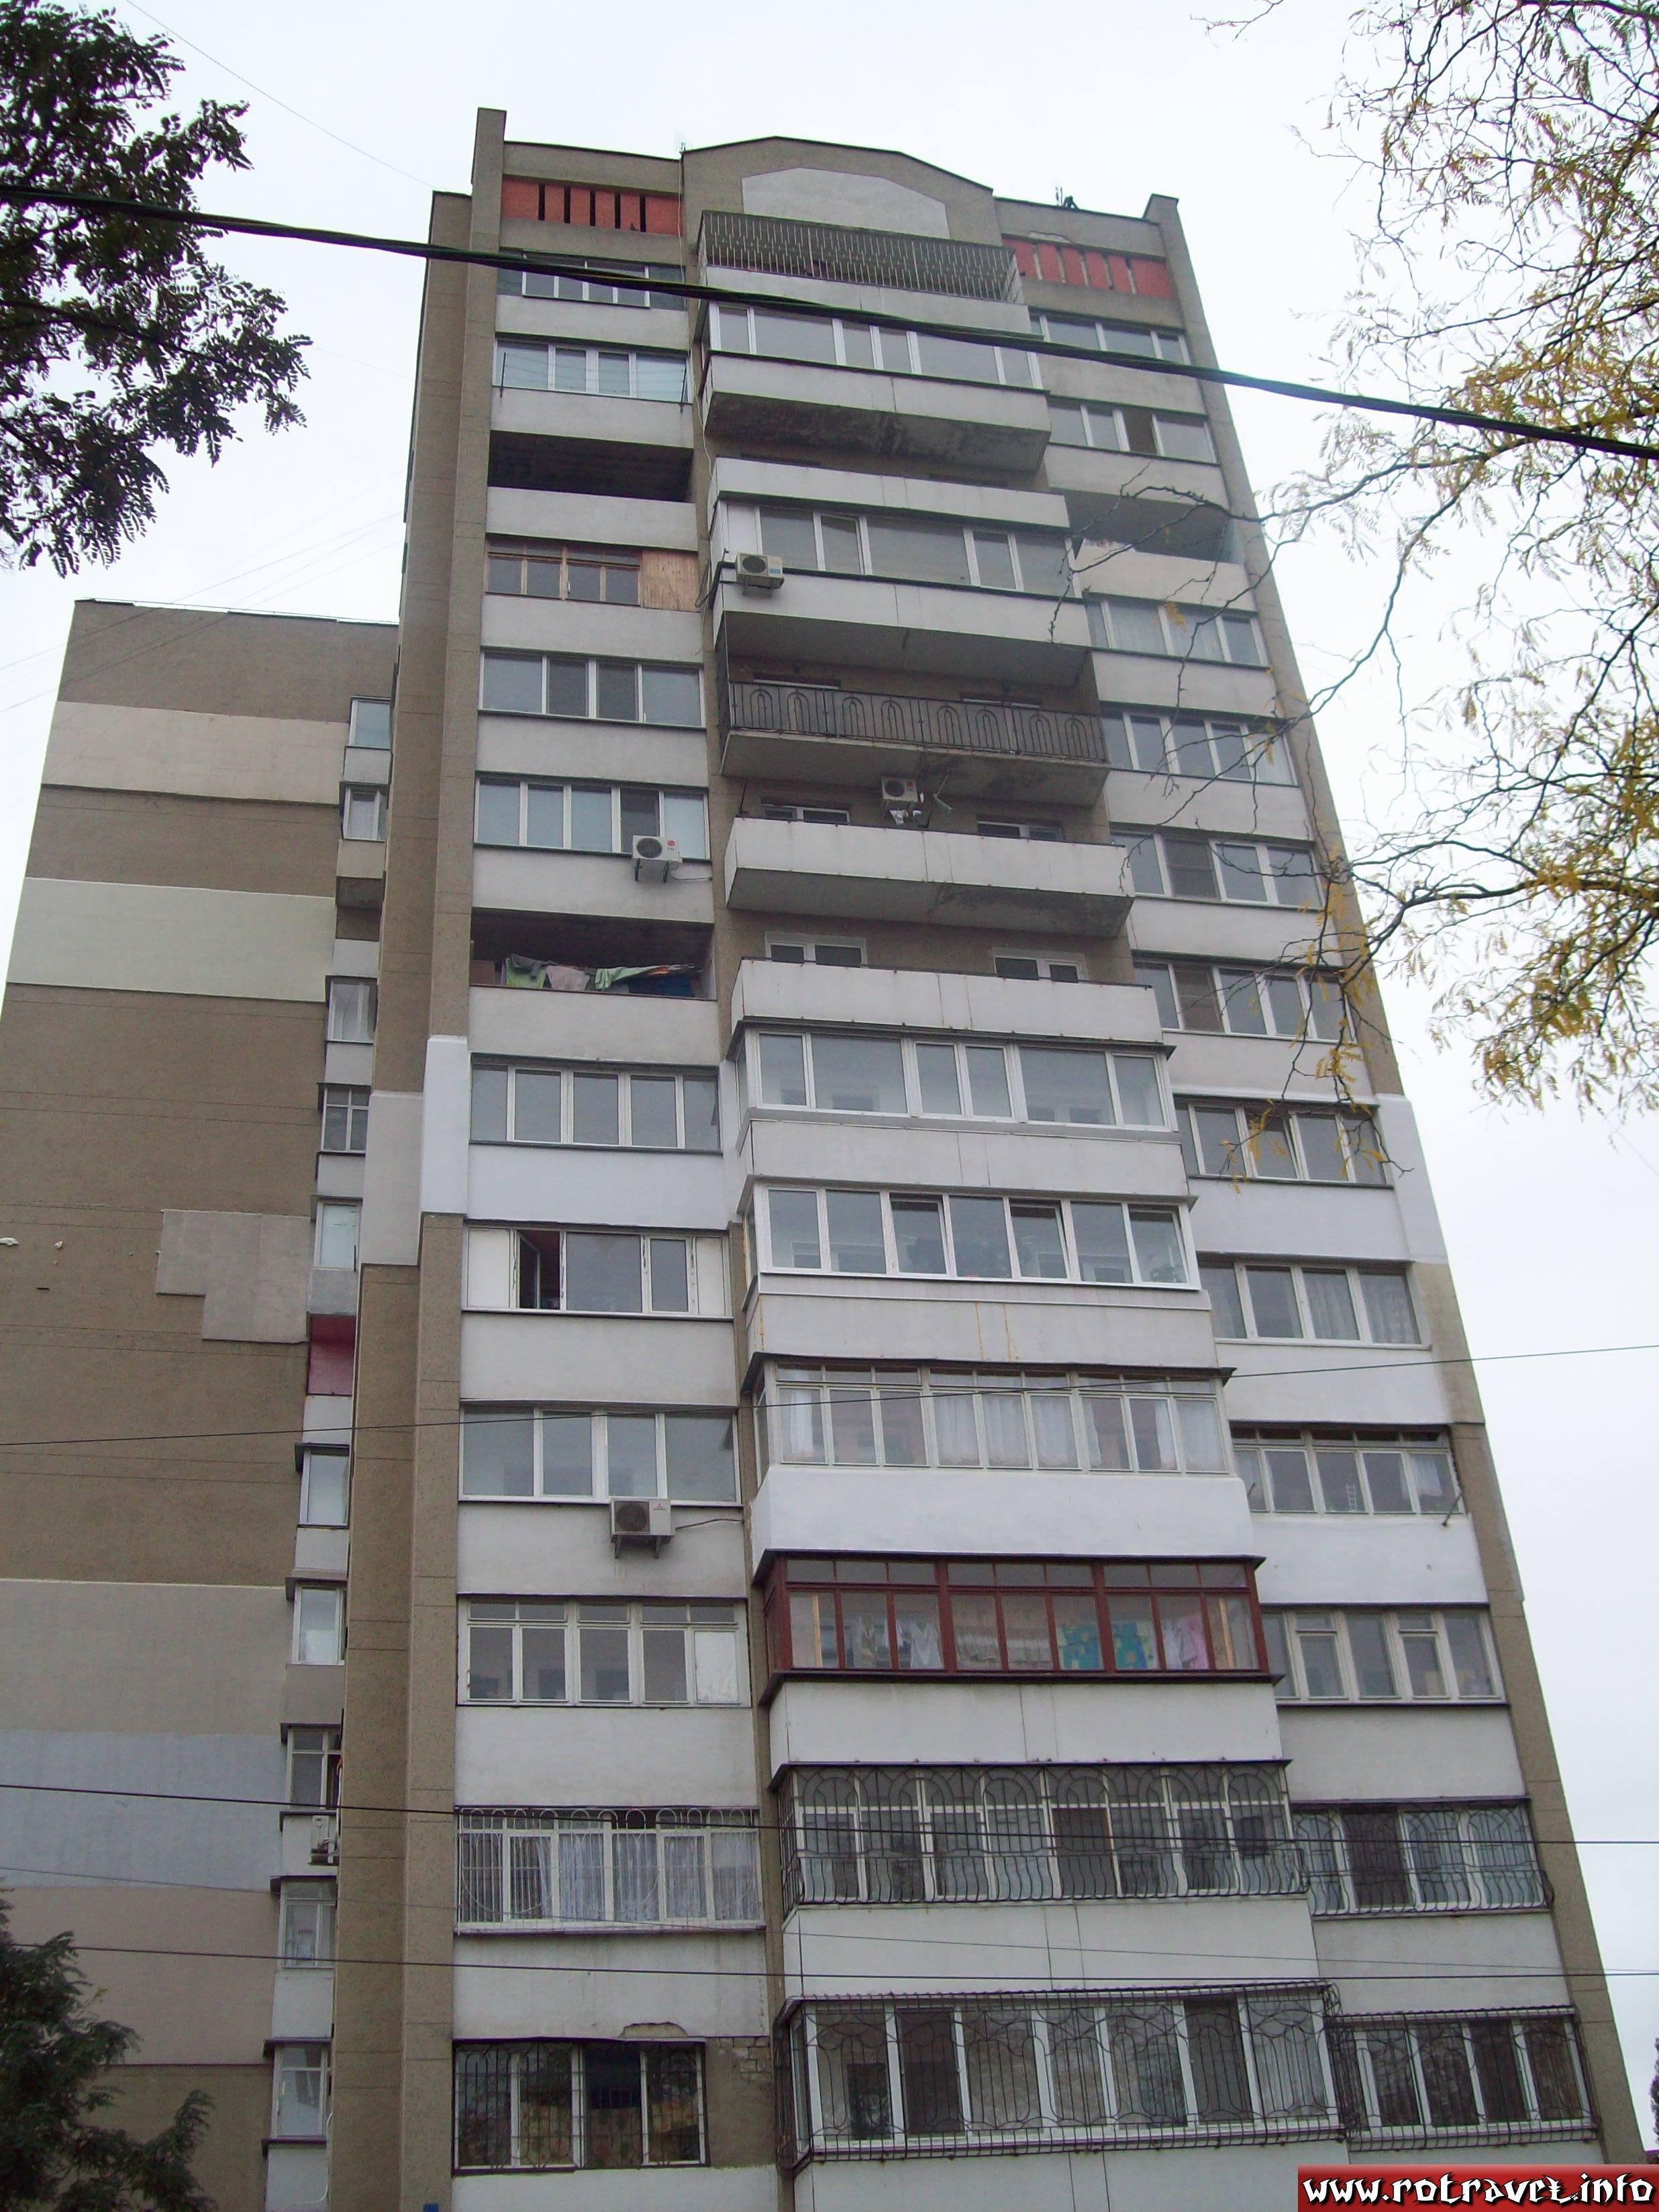 A soviet block